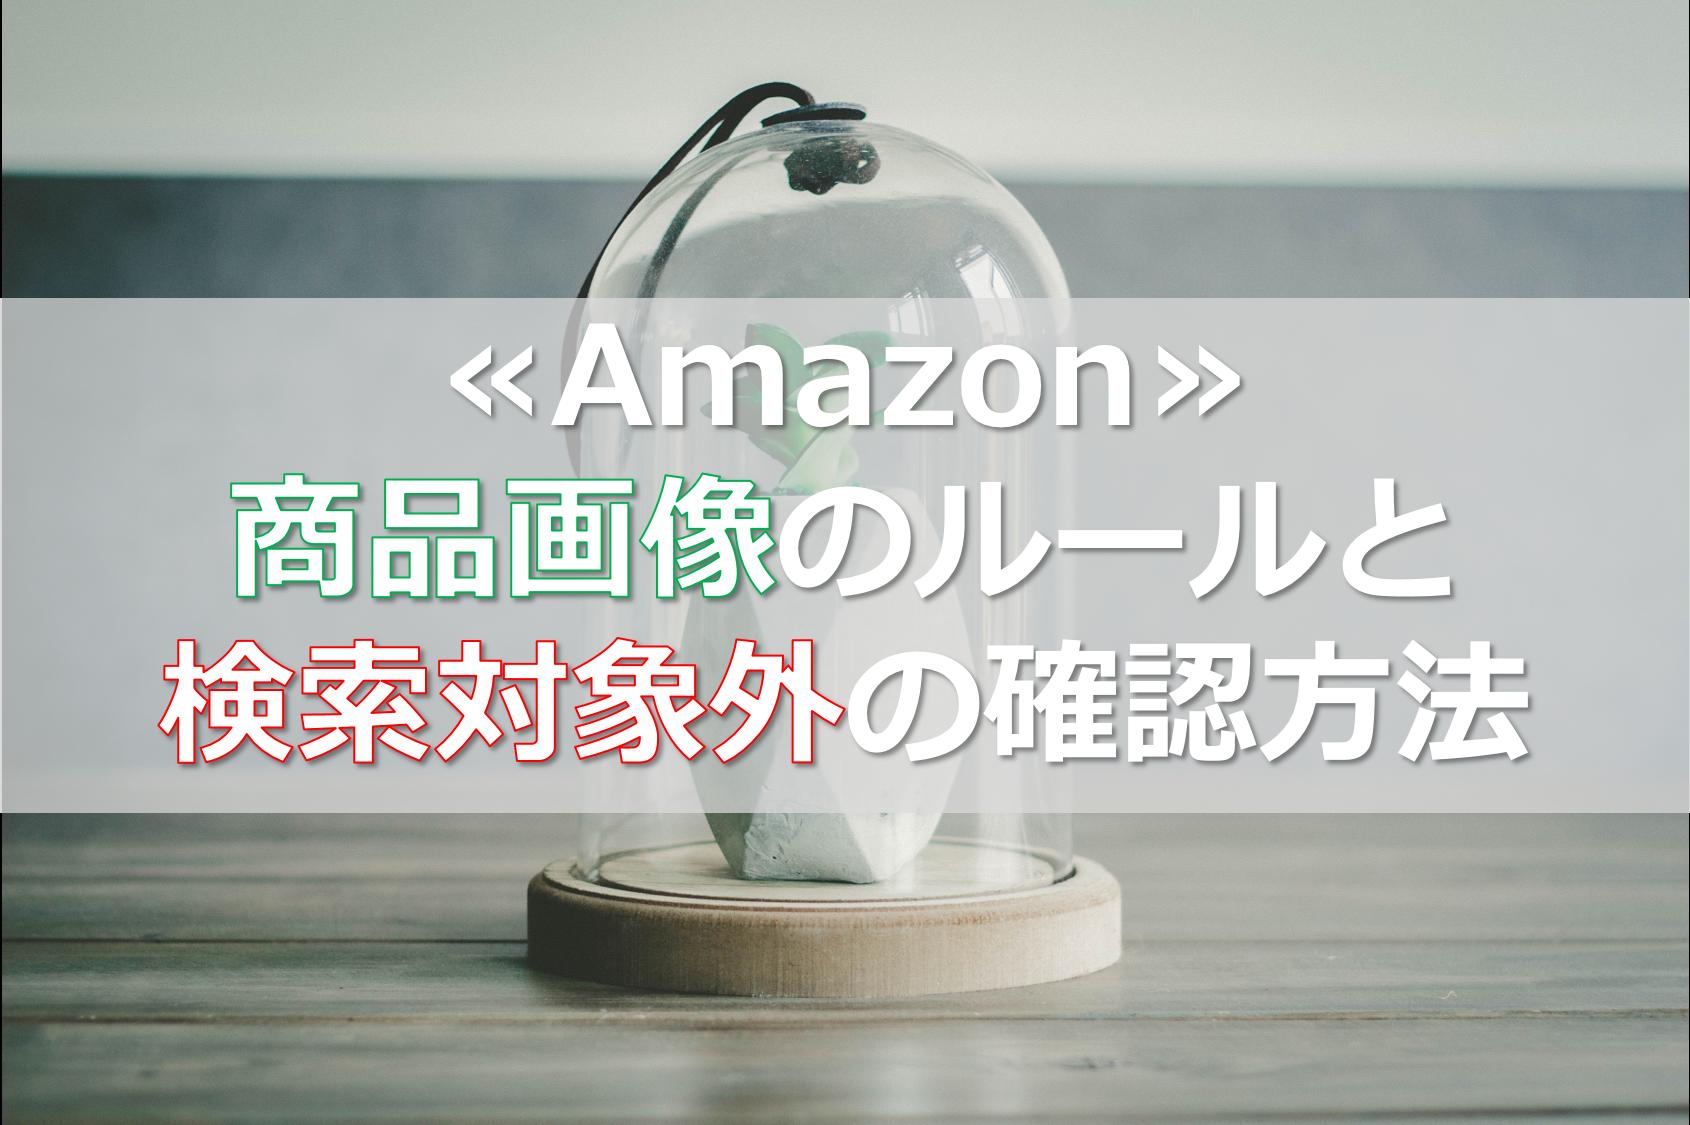 ≪Amazon≫商品画像のルールと検索対象外の確認方法